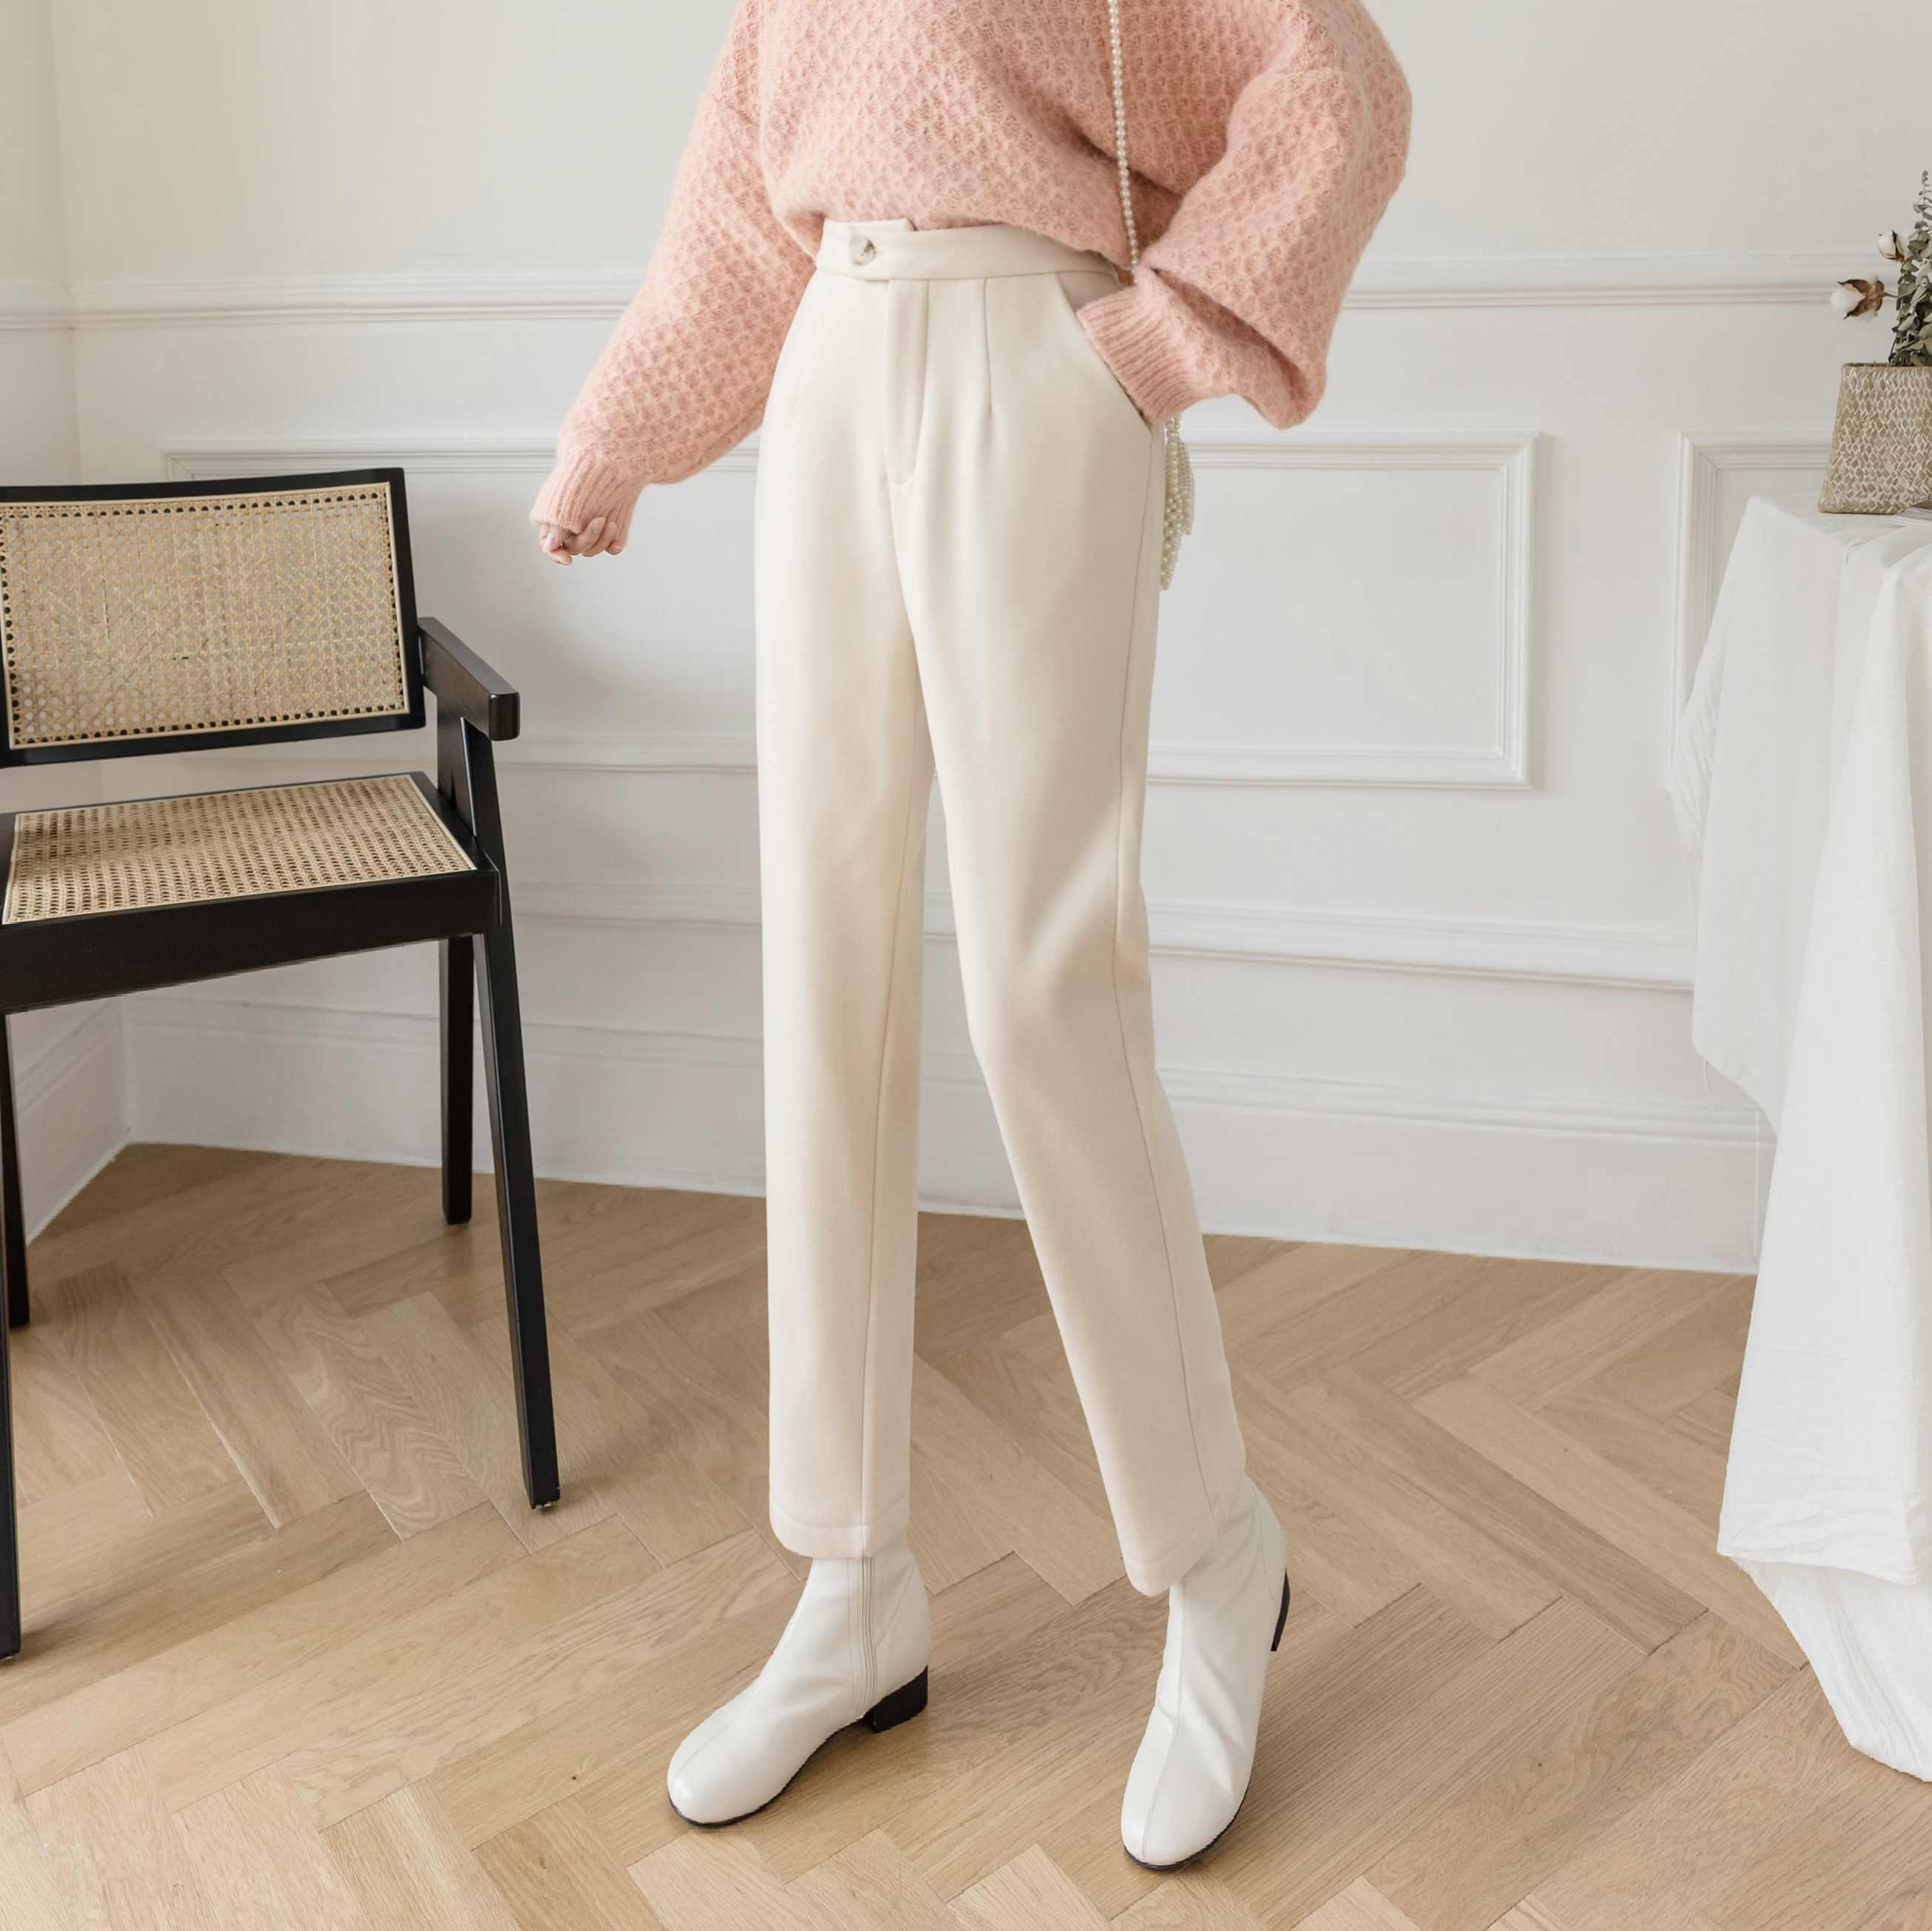 Pantalones De Traje De Lana Gruesa Para Mujer Pantalones Rectos De Cintura Alta De Cachemira Para Otono E Invierno 2021 Pantalones Y Pantalones Capri Aliexpress